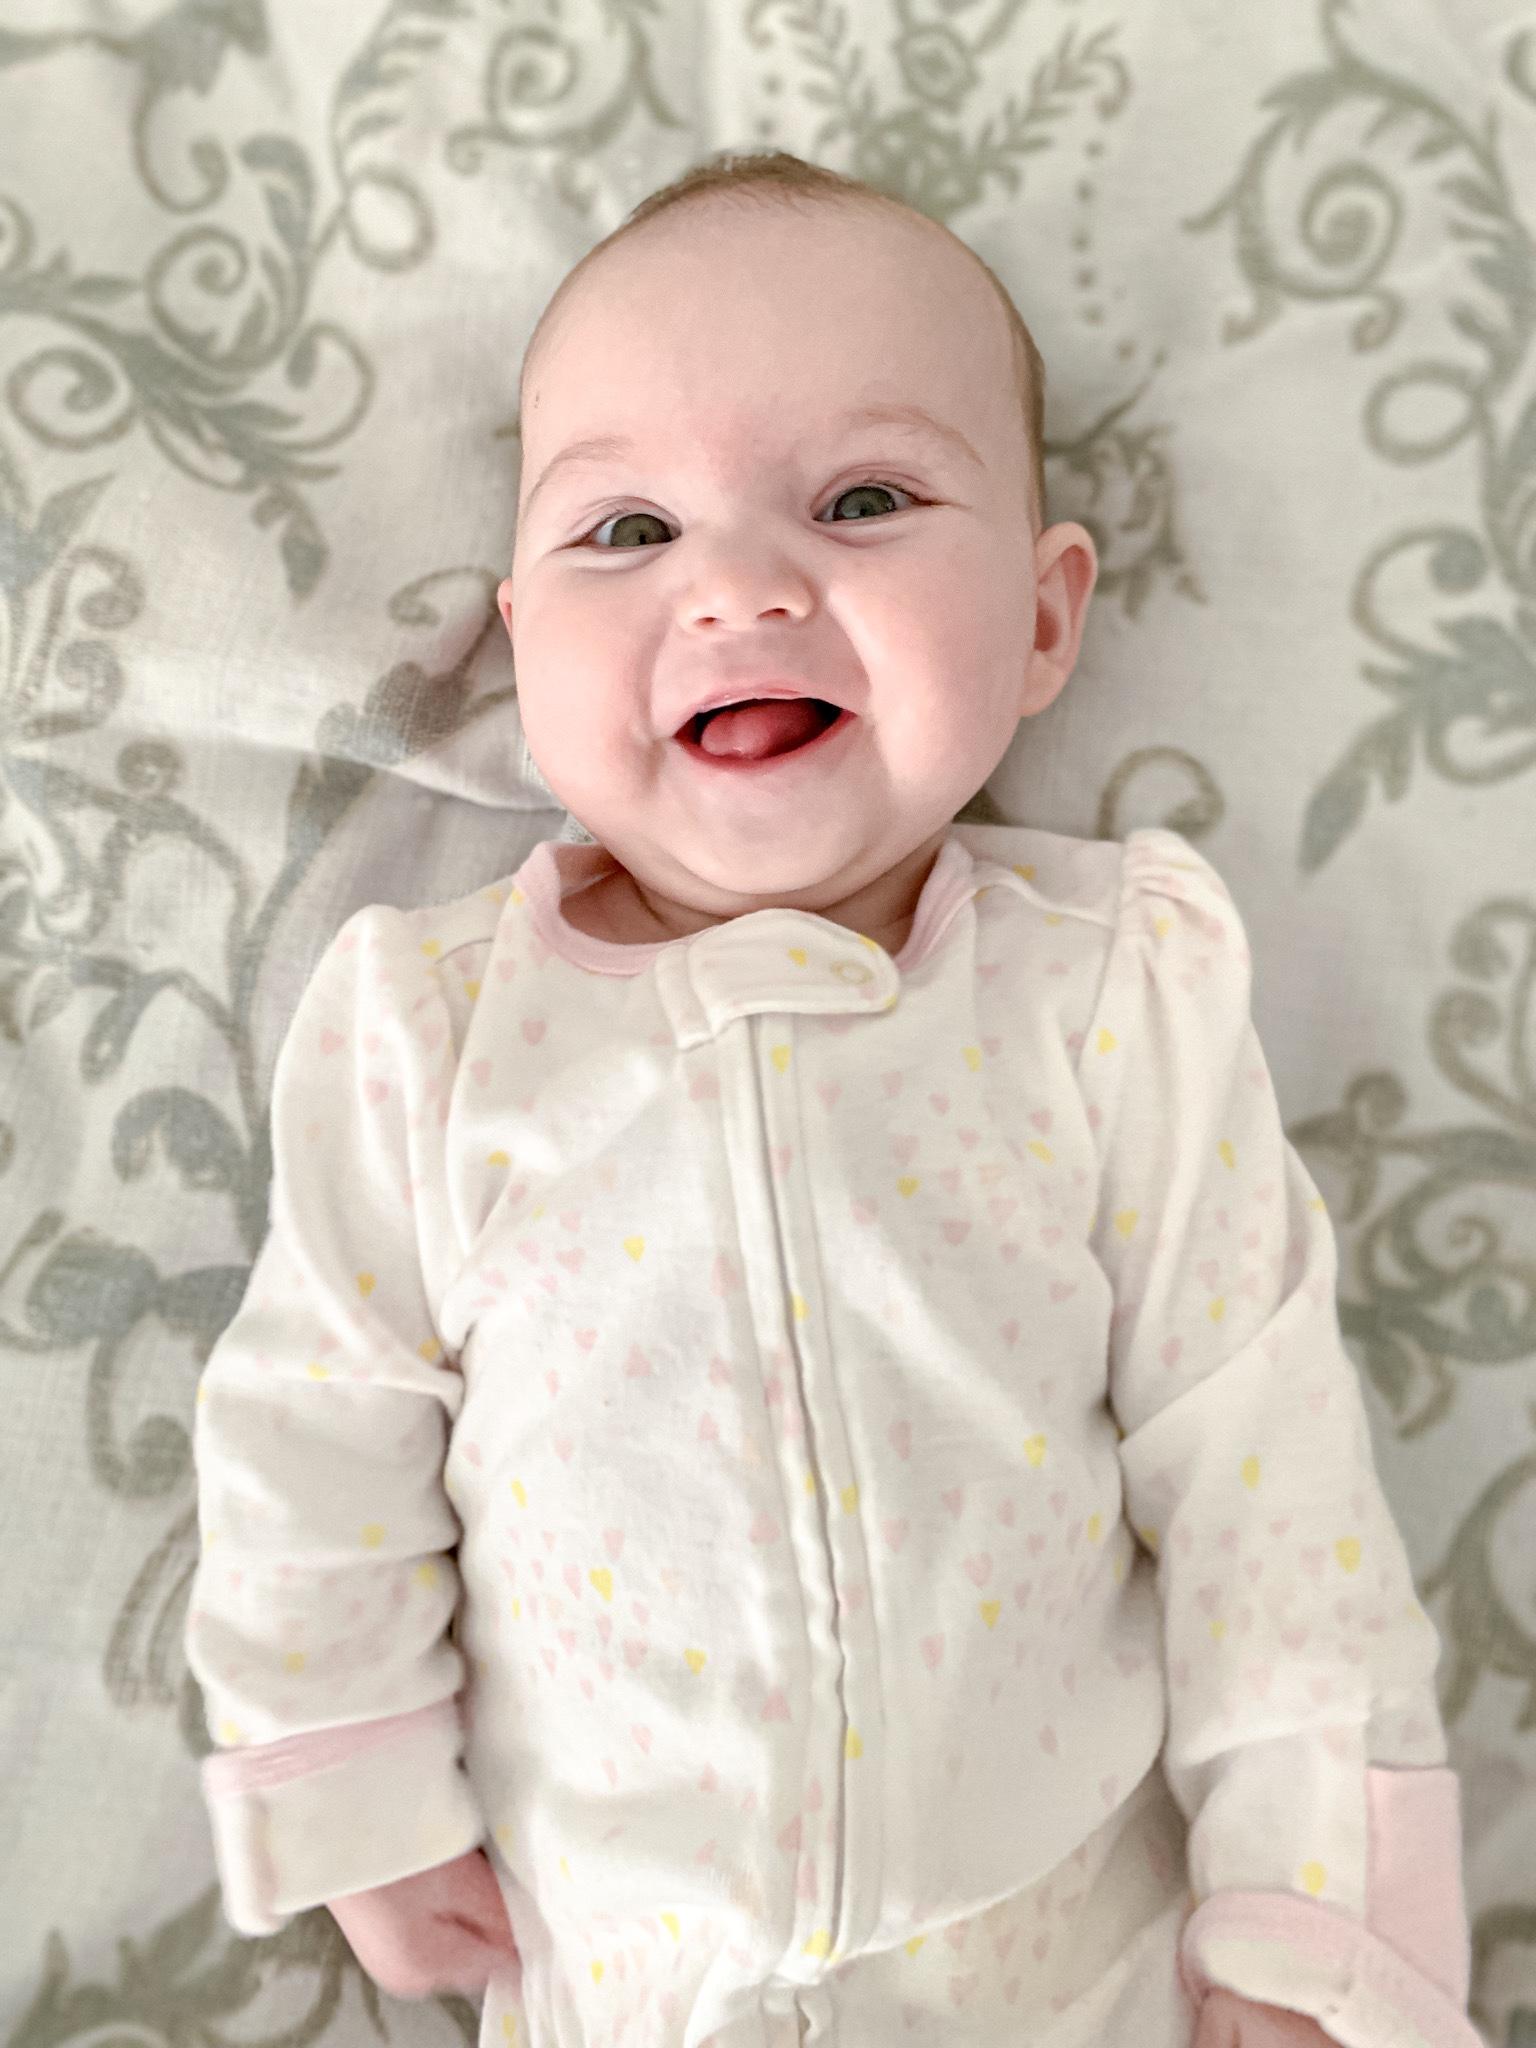 5 Months of Iyla Noelle